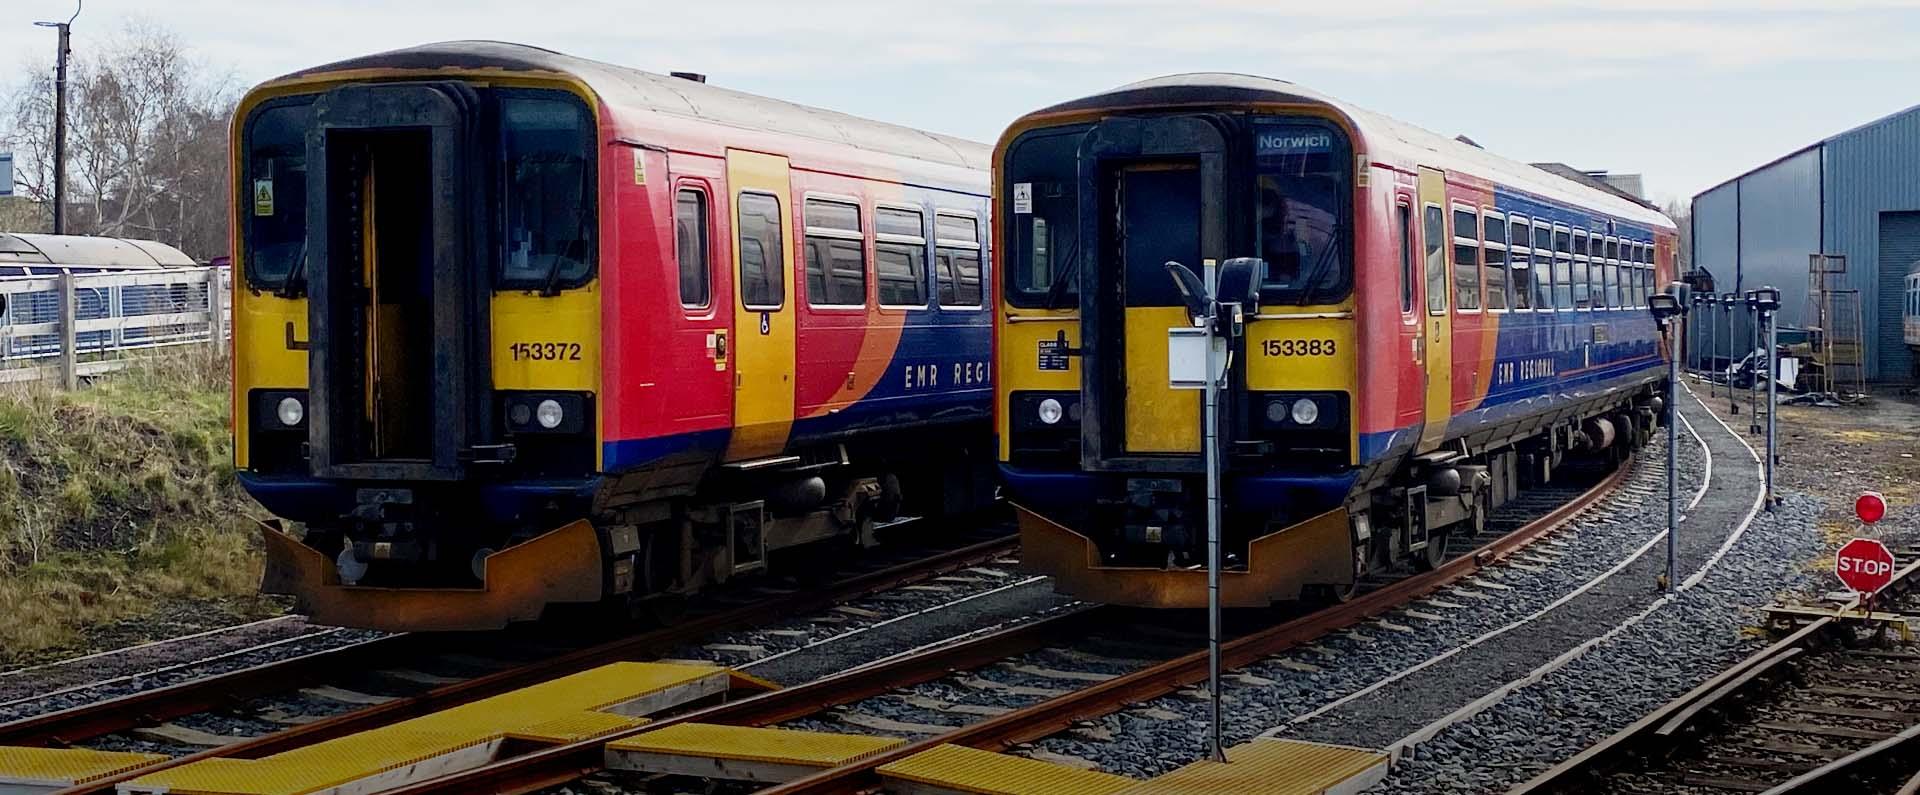 Barrow Hill - Storage for Mainline Rail Vehicles